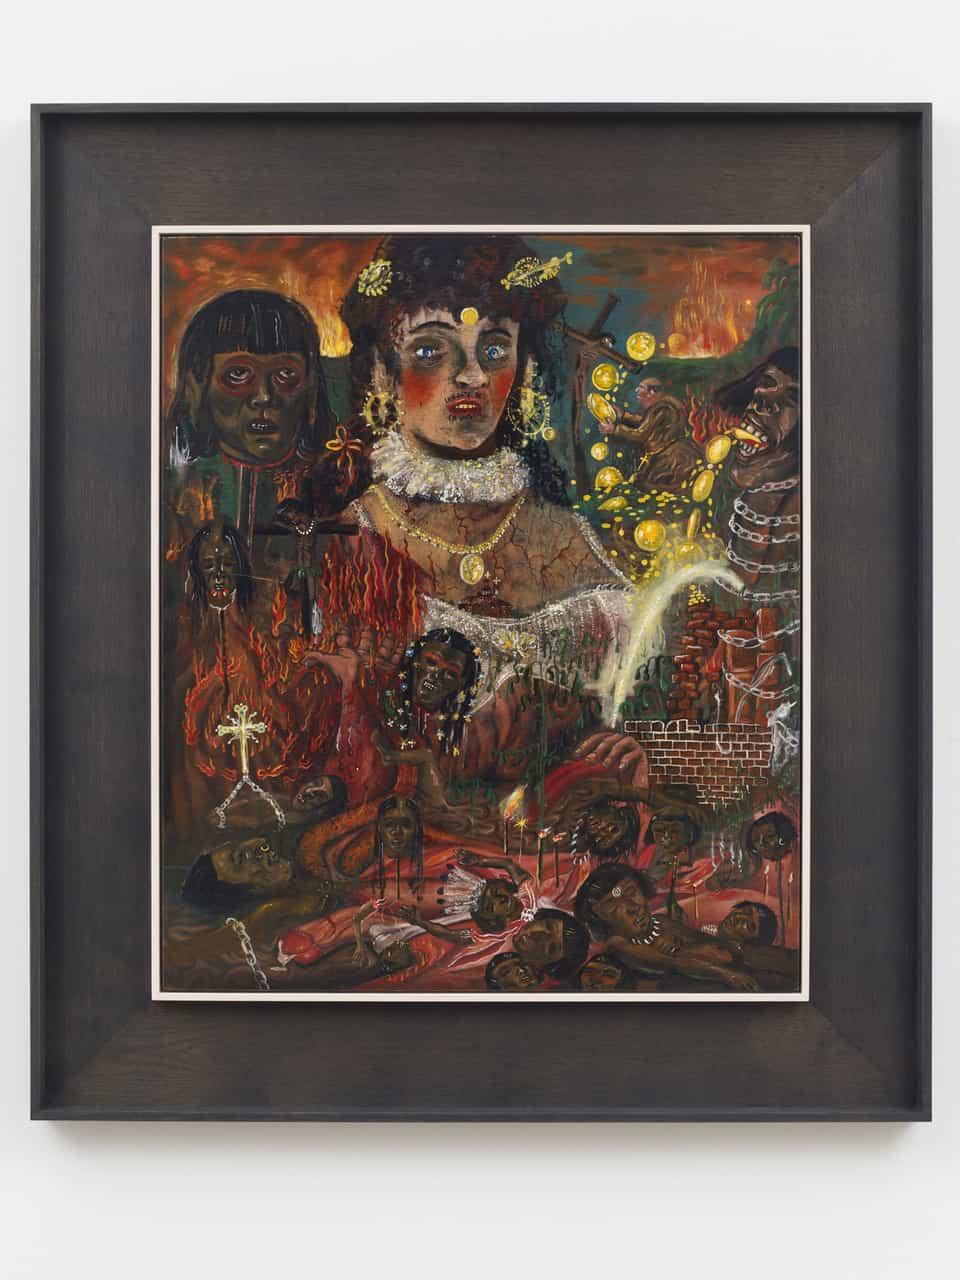 Jakub Julian Ziółkowski, Liberate Te Ex Infernis, 2017, 68 x 57 cm, oil on panel, courtesy of the artist